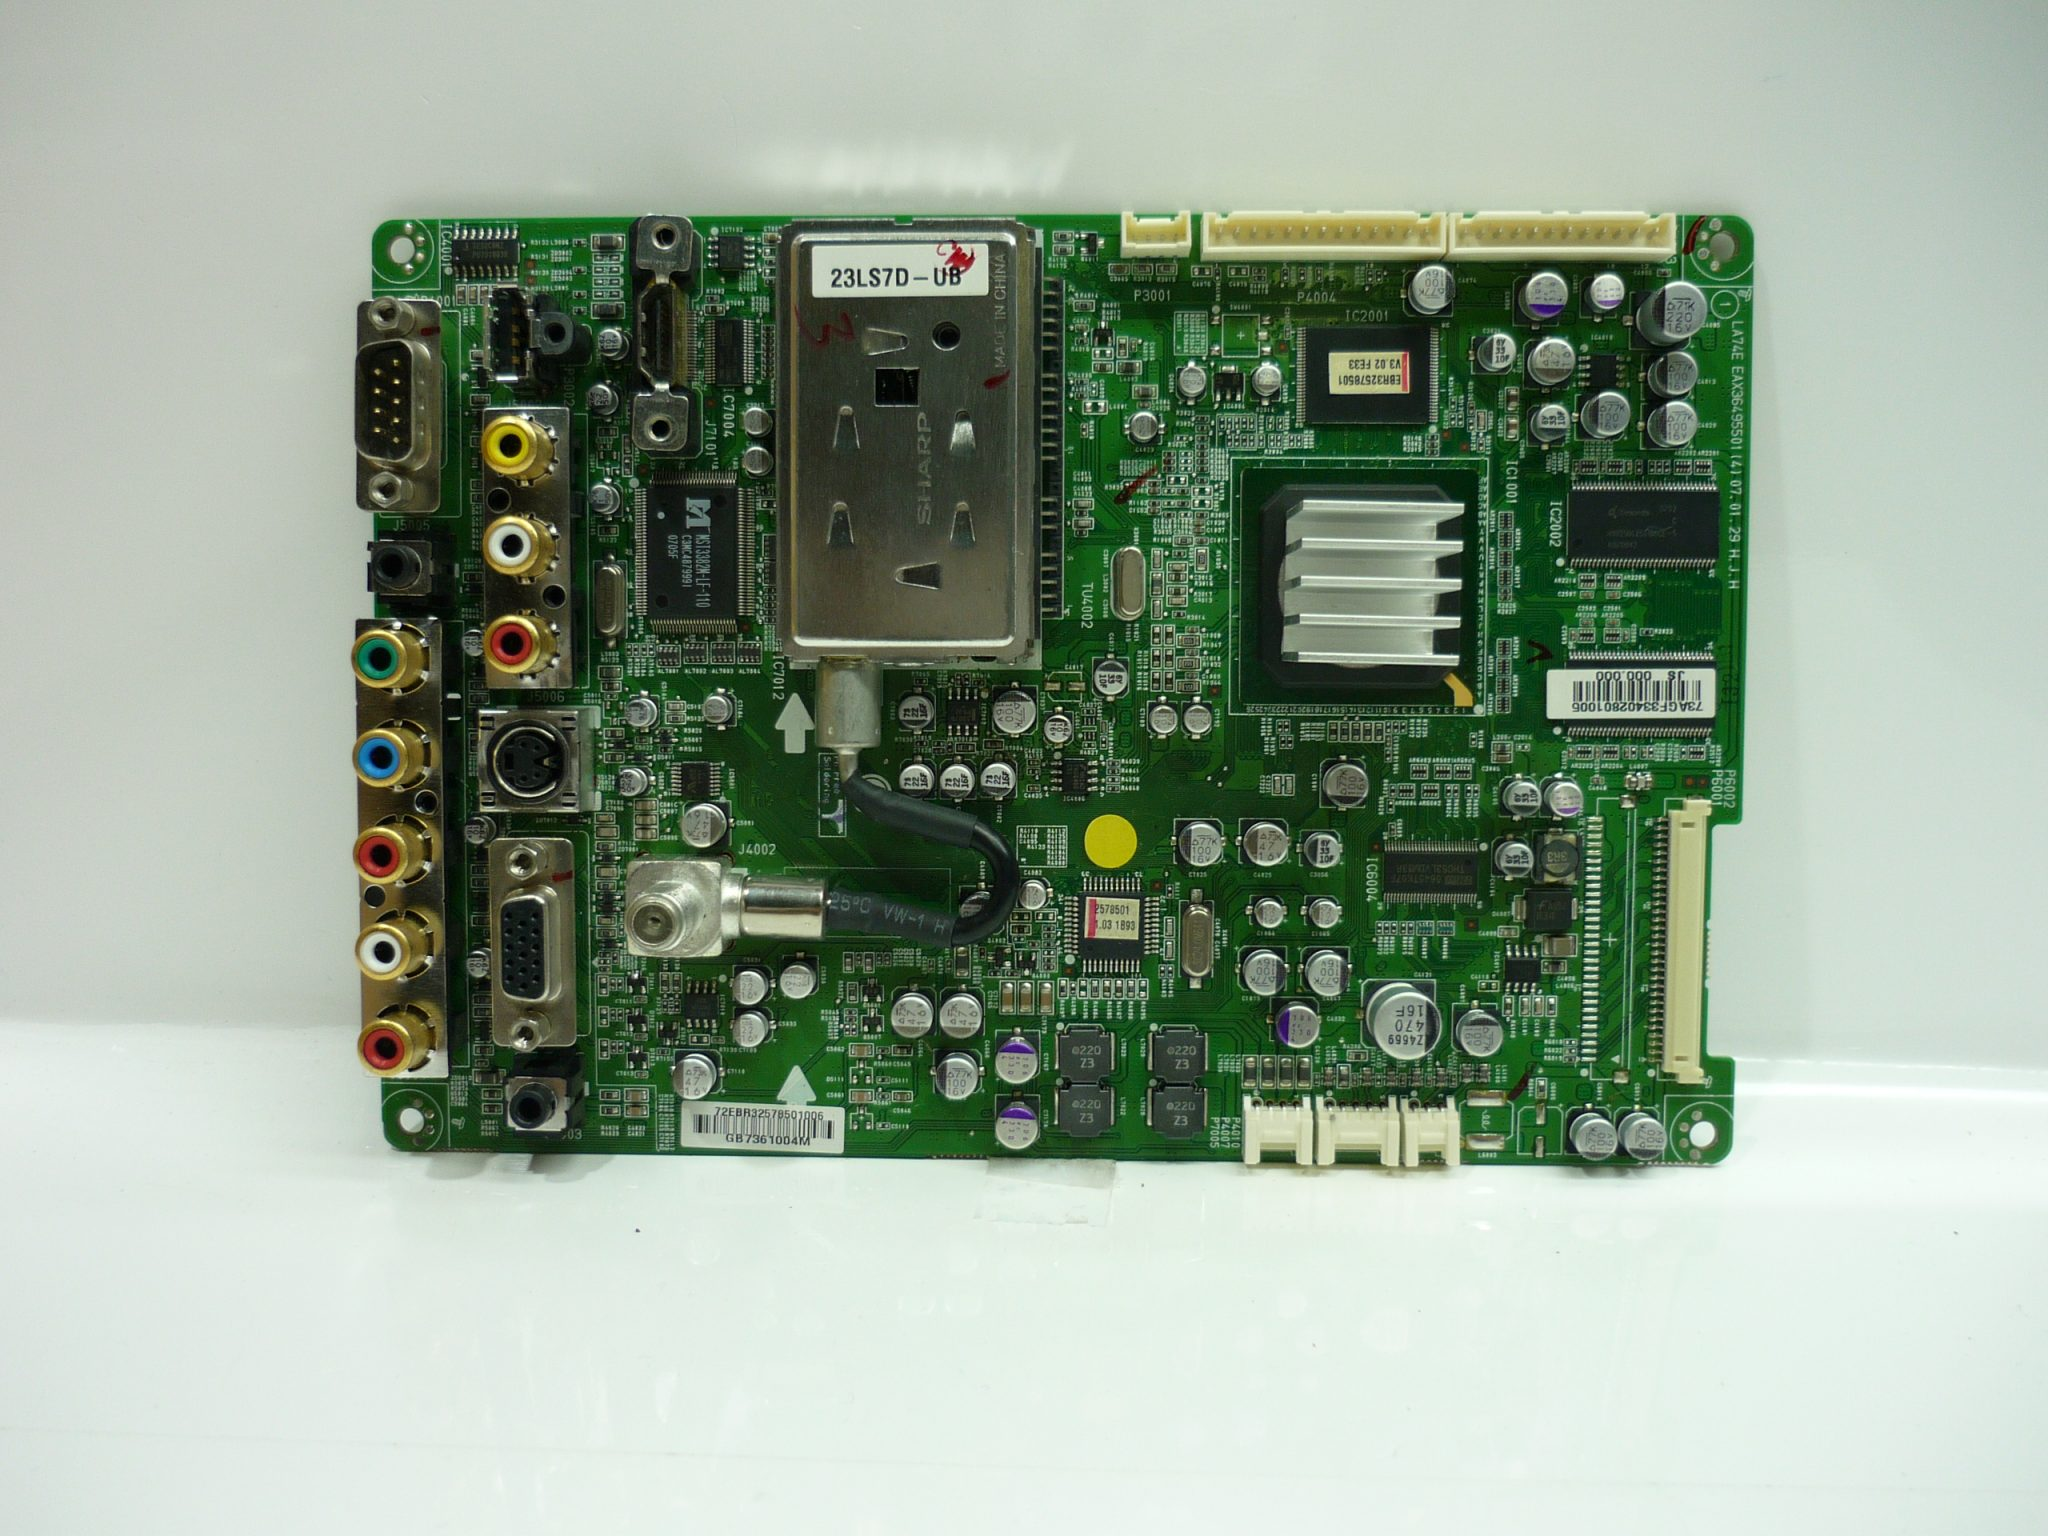 LG EBR32578501 (AGF33402801) Main Board for 23LS7D-UB